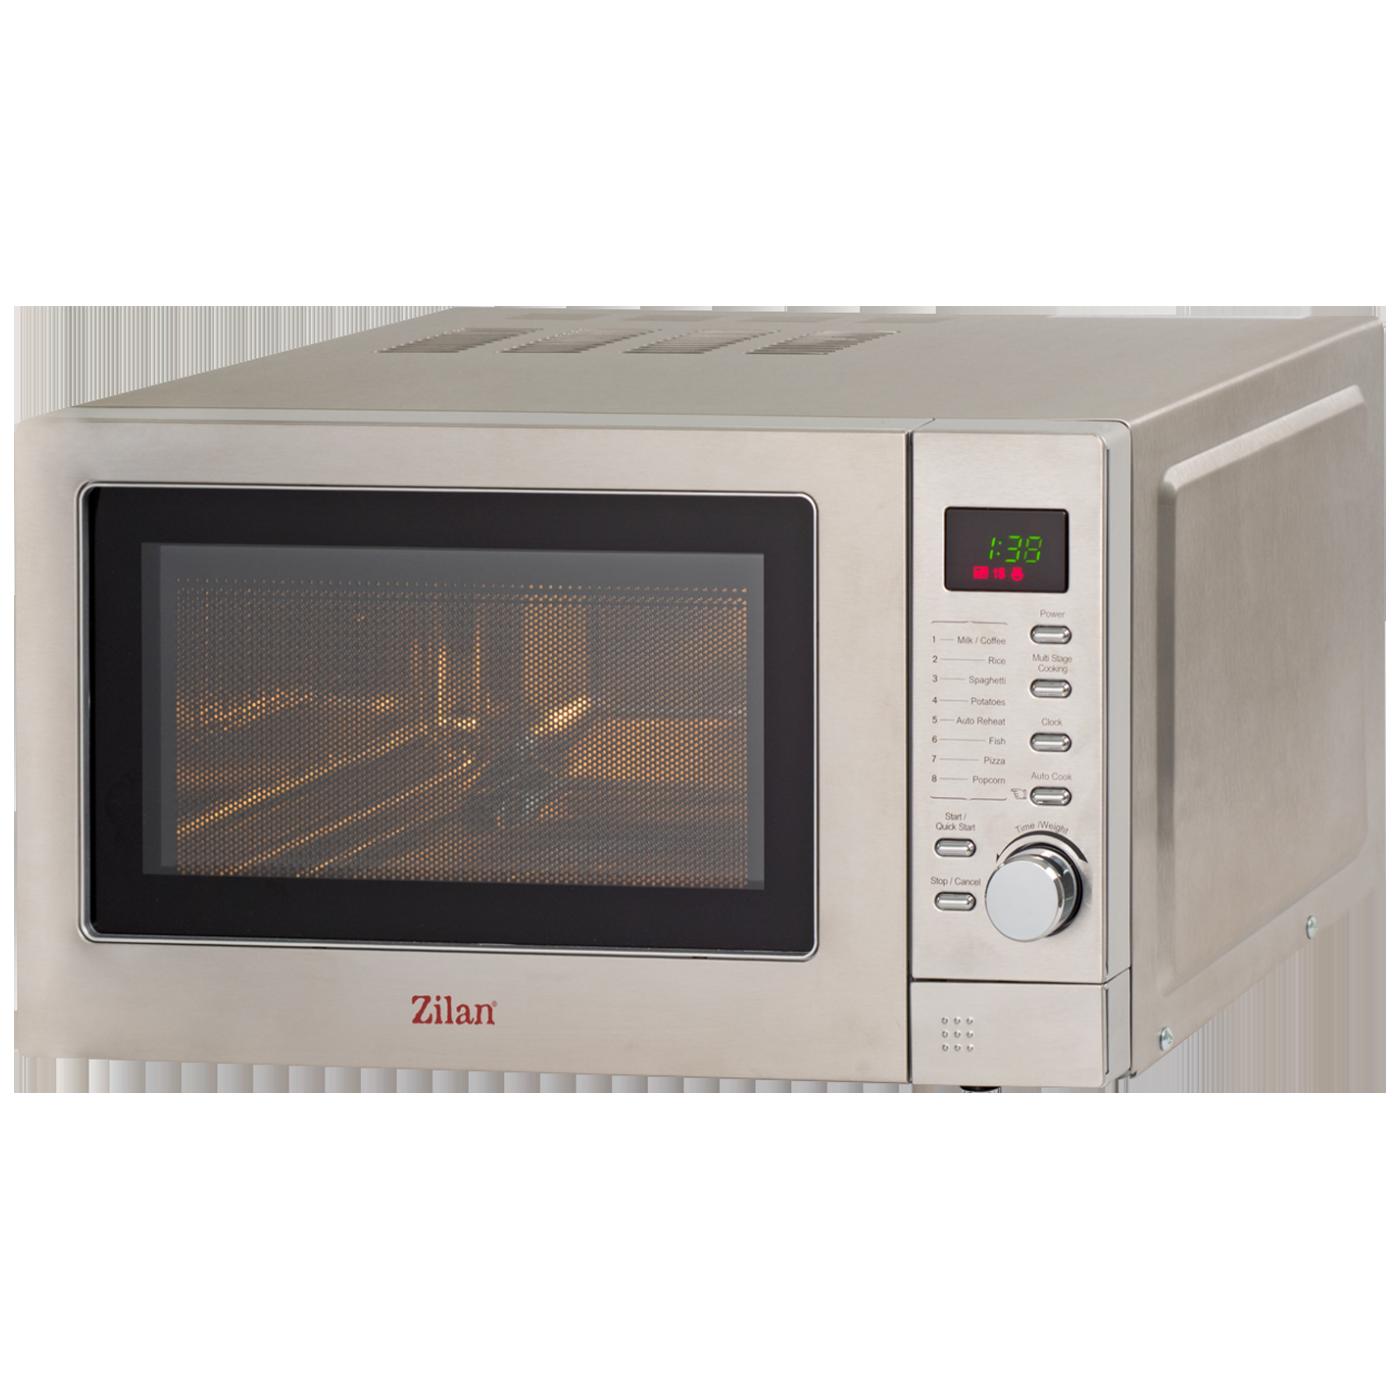 Mikrovalna pećnica, zapremina 20 l, 800 W, INOX